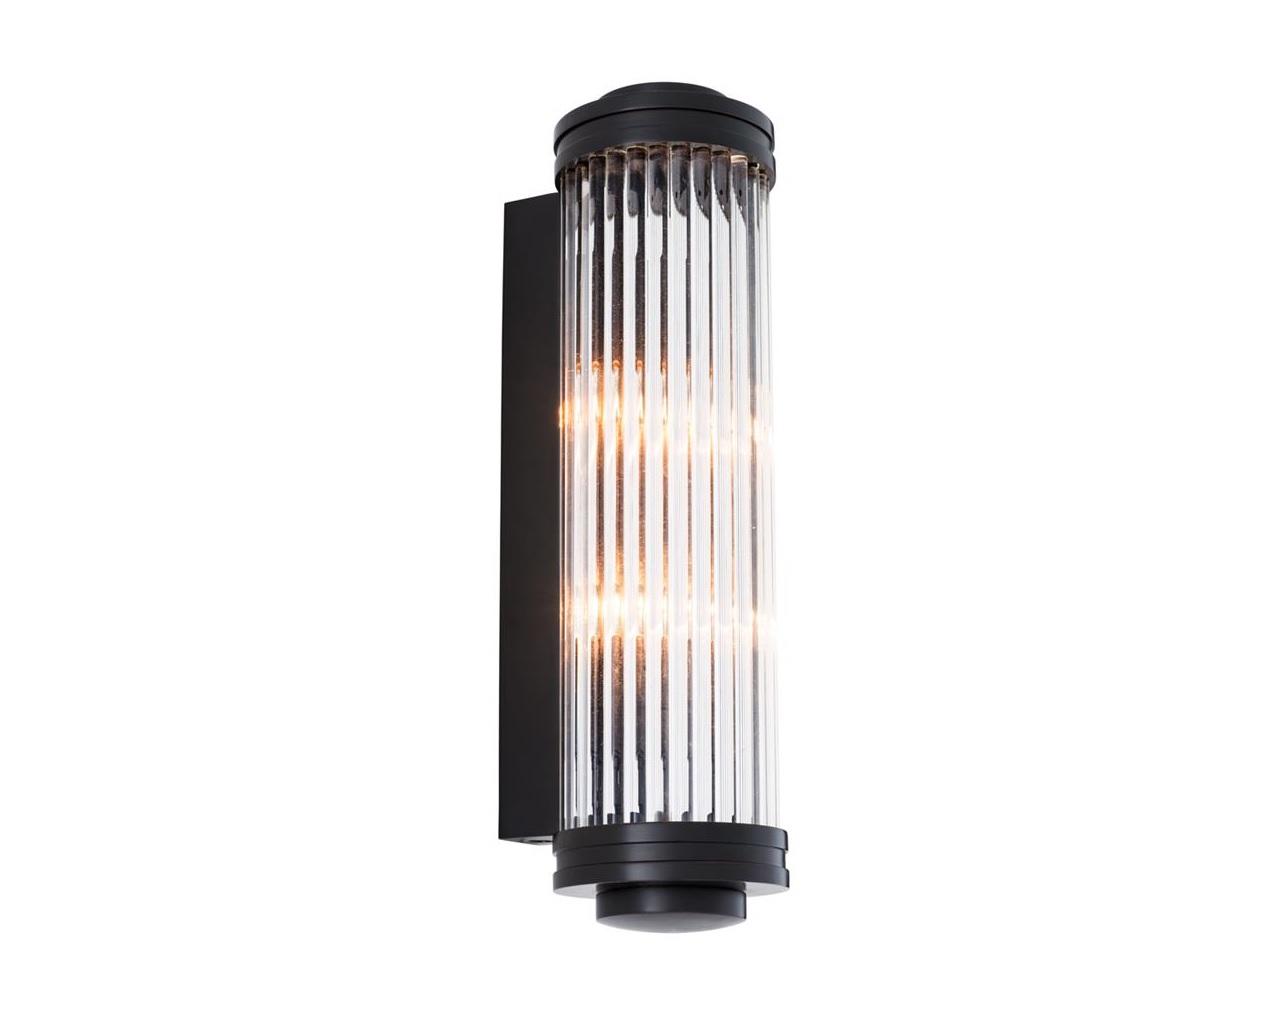 Настенный светильник Wall Lamp Gascogne LБра<br>&amp;lt;div&amp;gt;Вид цоколя: E14&amp;lt;br&amp;gt;&amp;lt;/div&amp;gt;&amp;lt;div&amp;gt;&amp;lt;div&amp;gt;Мощность: 40W&amp;lt;/div&amp;gt;&amp;lt;div&amp;gt;Количество ламп: 2 (нет в комплекте)&amp;lt;/div&amp;gt;&amp;lt;/div&amp;gt;<br><br>Material: Металл<br>Ширина см: 11<br>Высота см: 40<br>Глубина см: 14